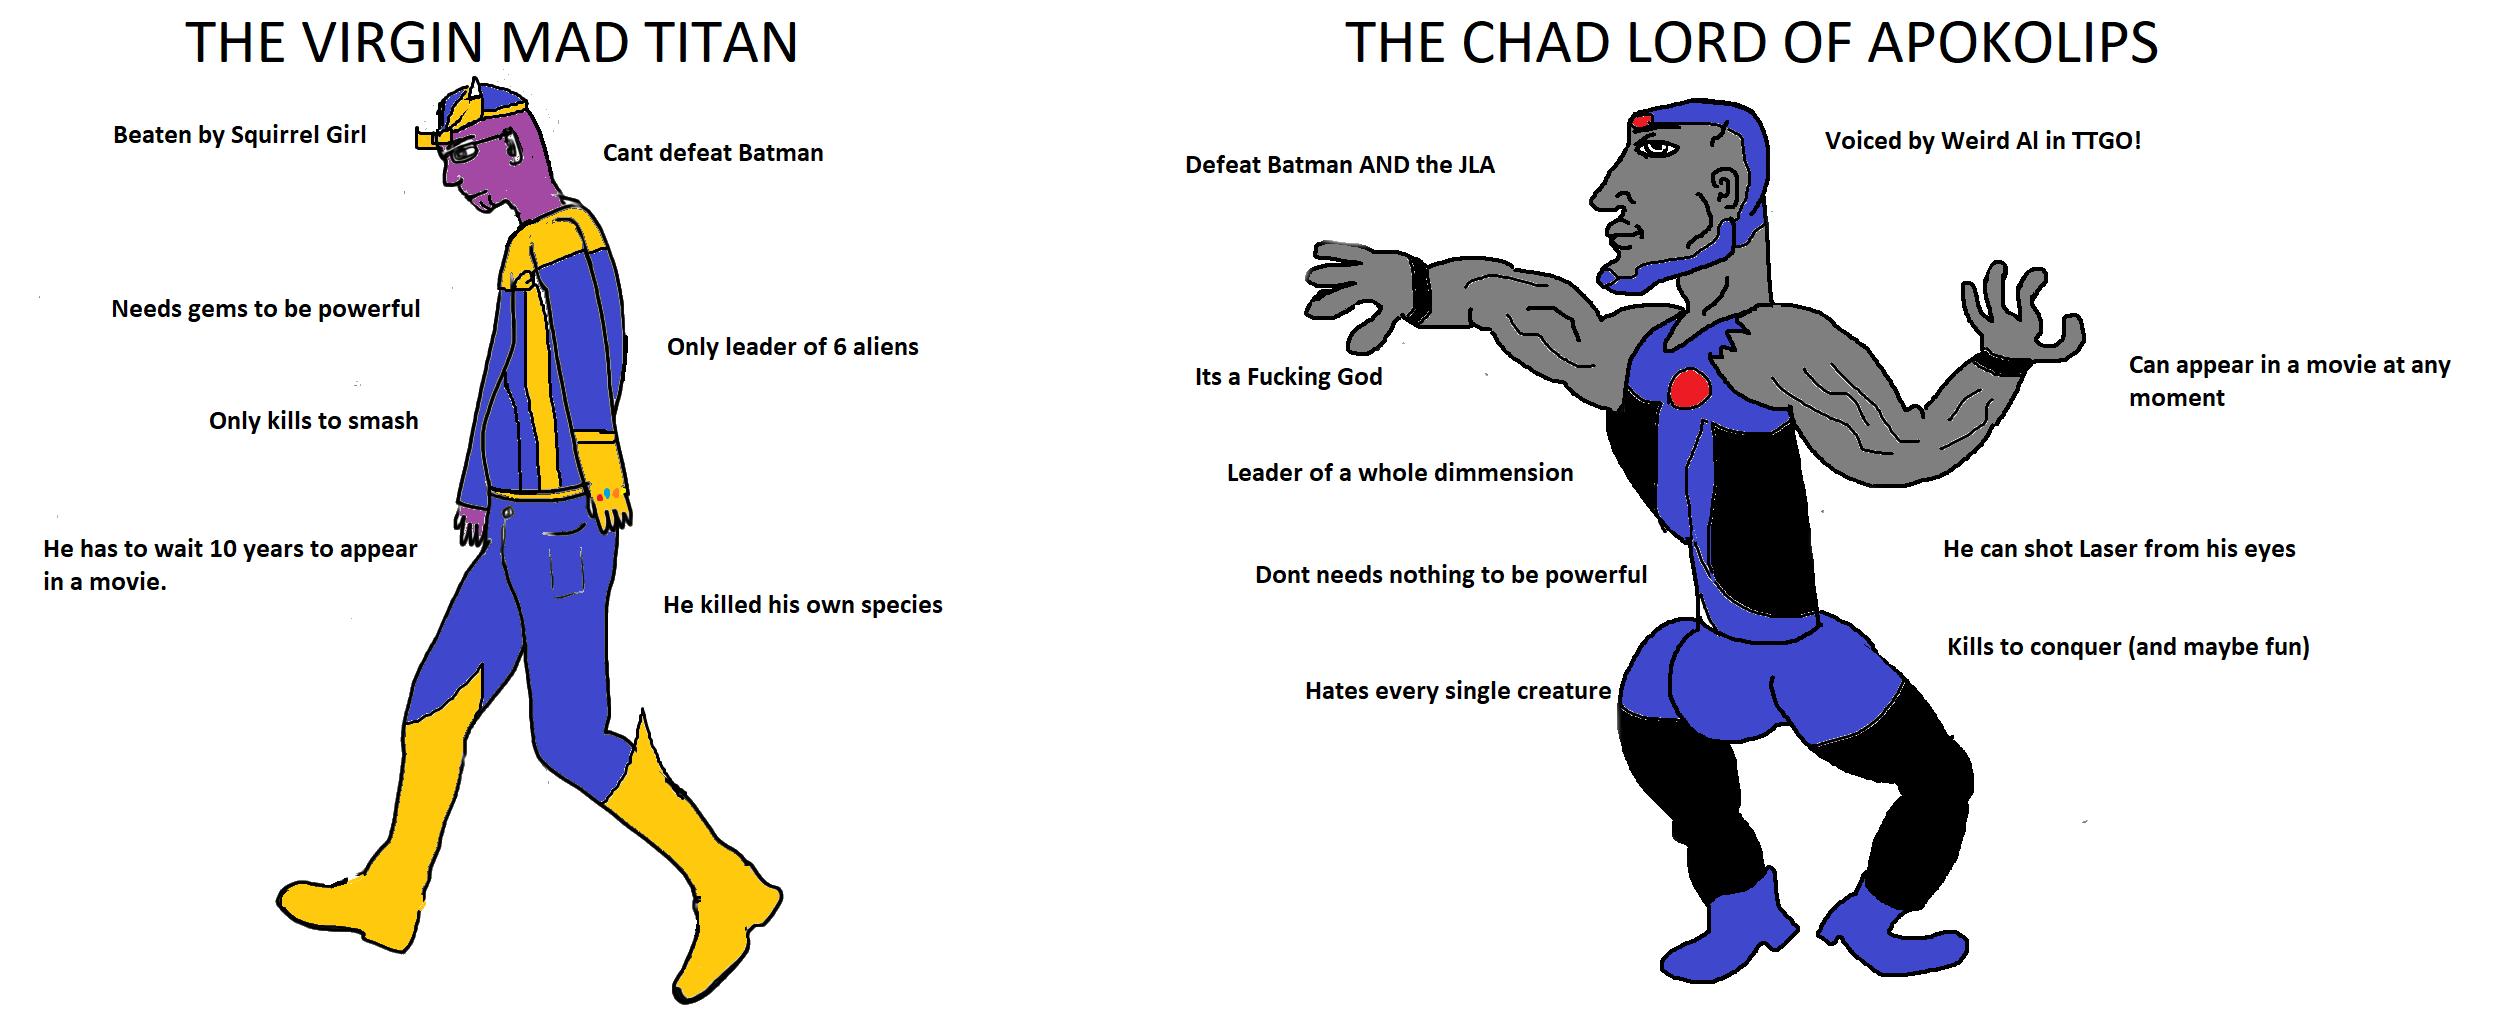 The Virgin Mad titan vs The Chad Lord of apokolips | Virgin vs  Chad